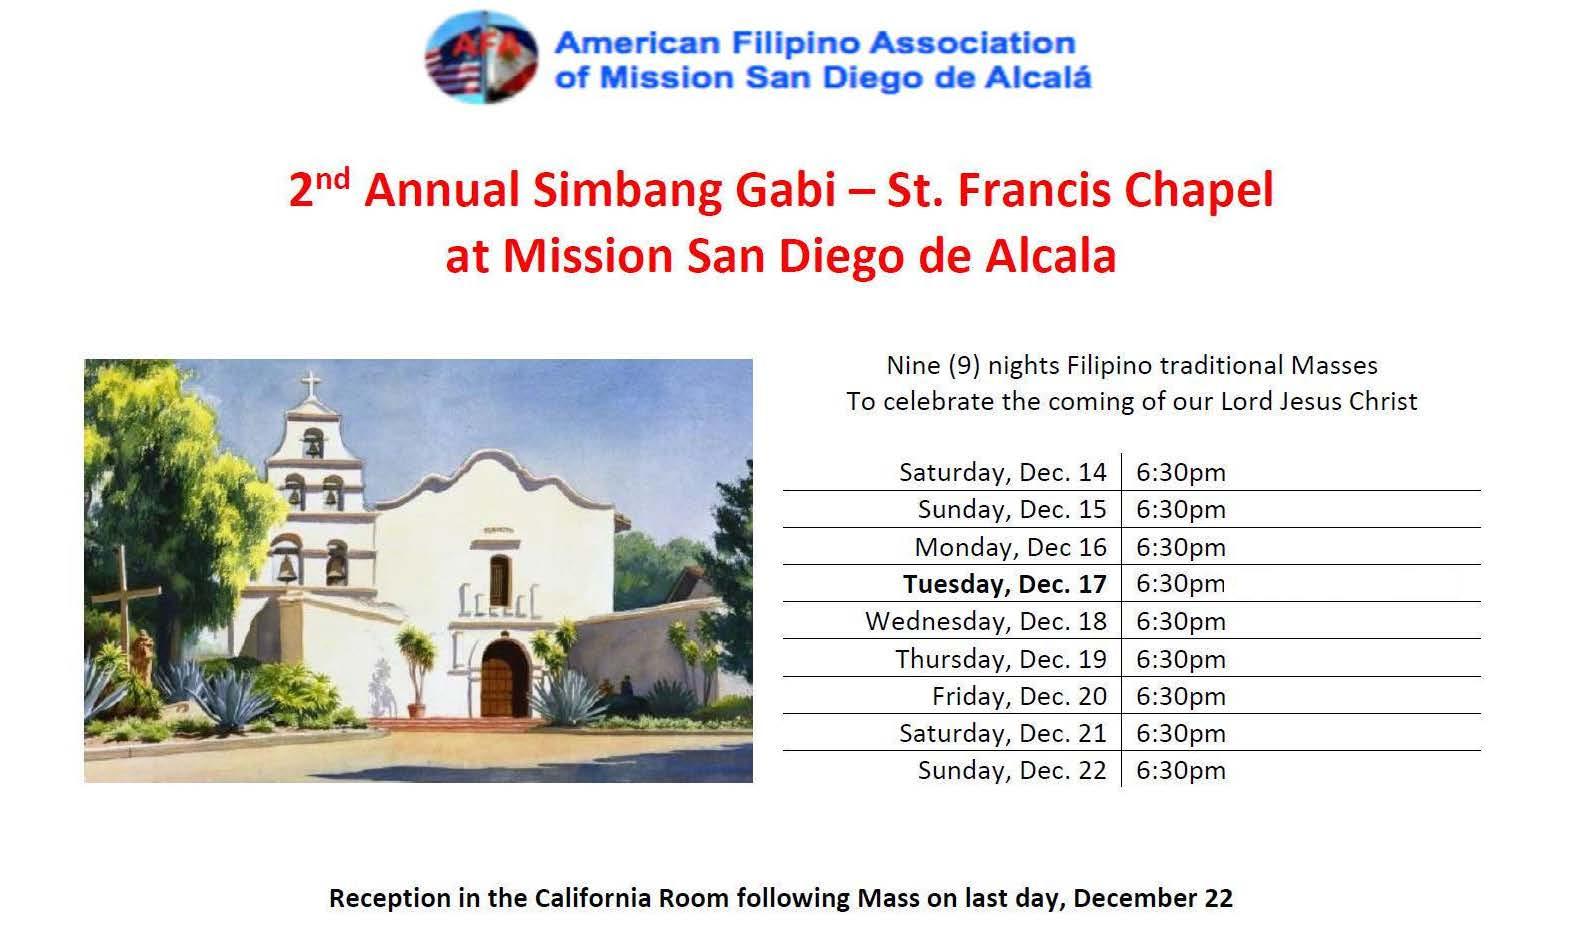 2nd Annual Simbang Gabi at Mission San Diego